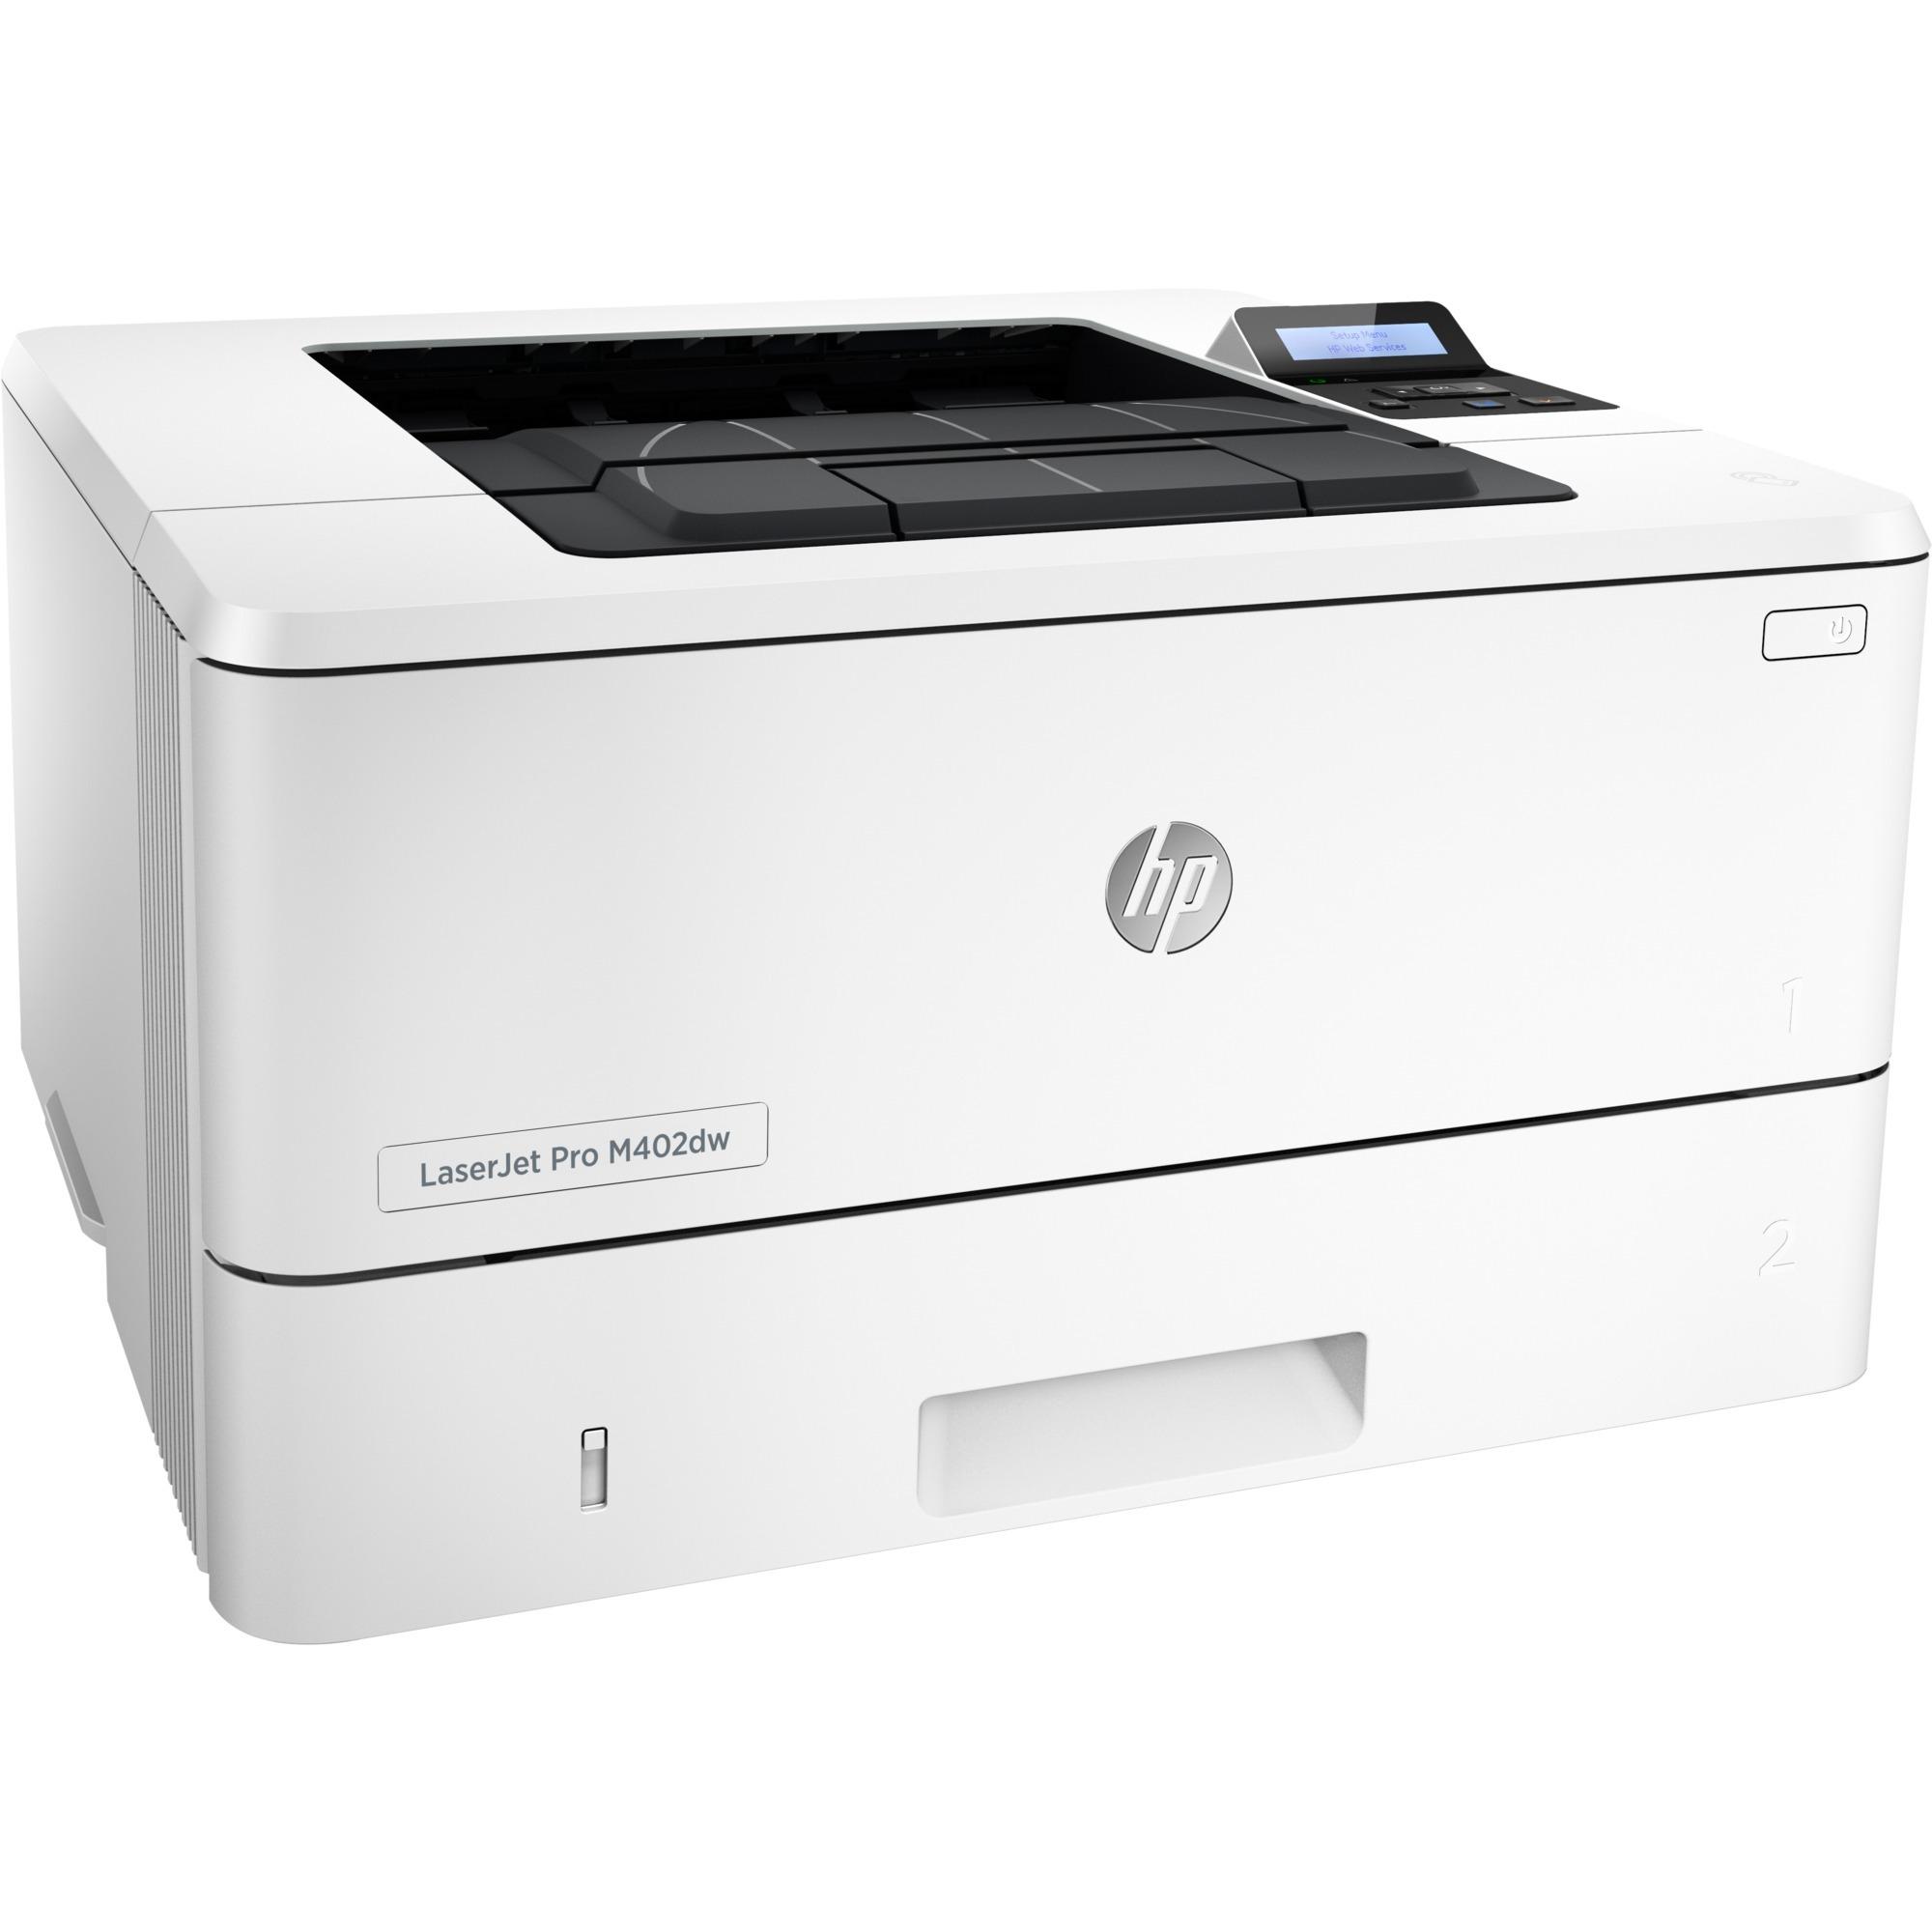 LaserJet M402dw 4800 x 600 DPI A4 Wifi, Impresora láser